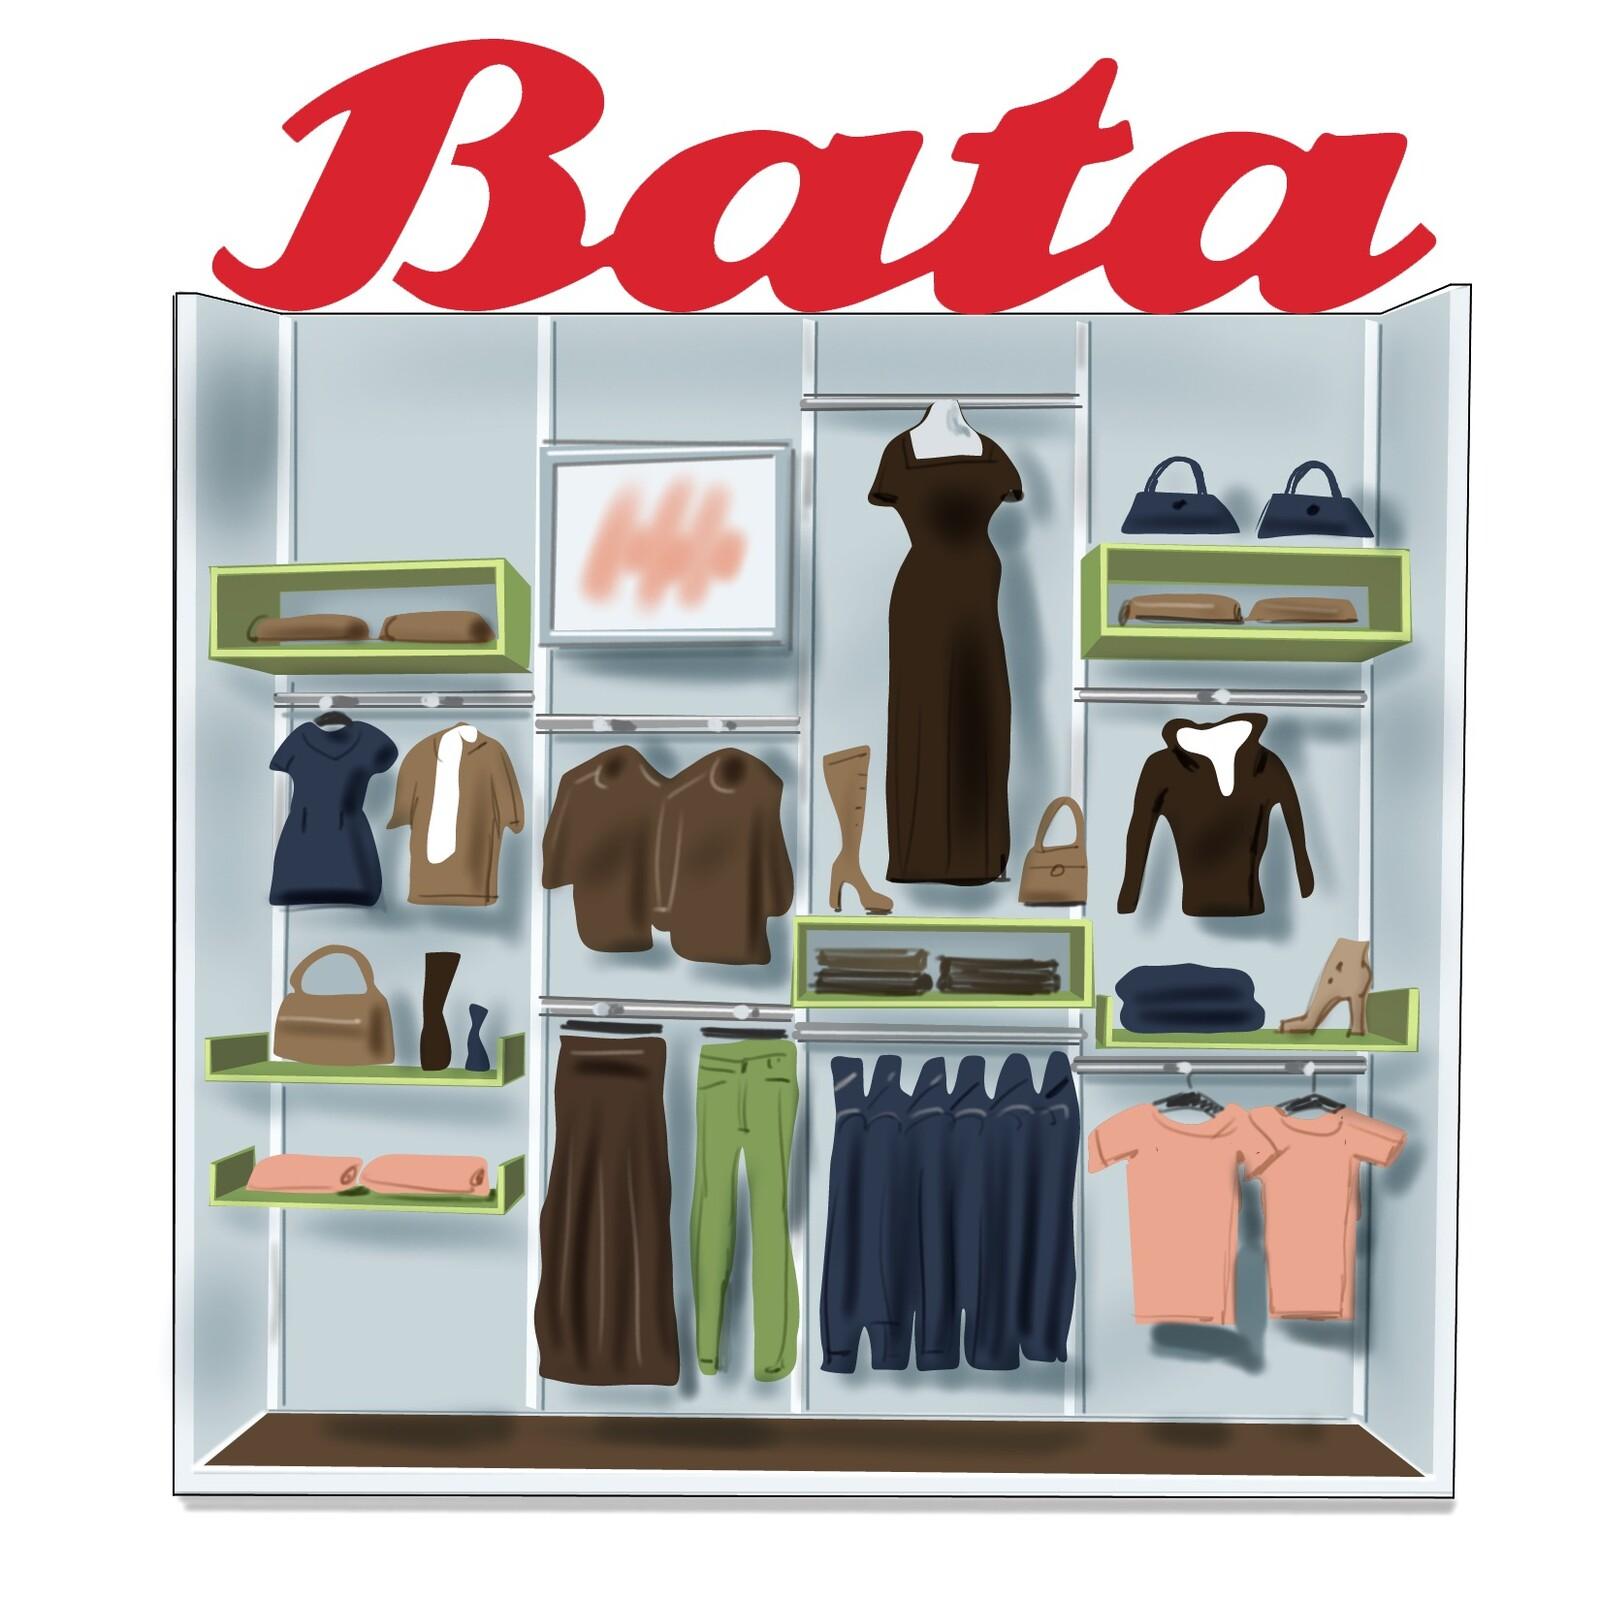 Bata wall displays.